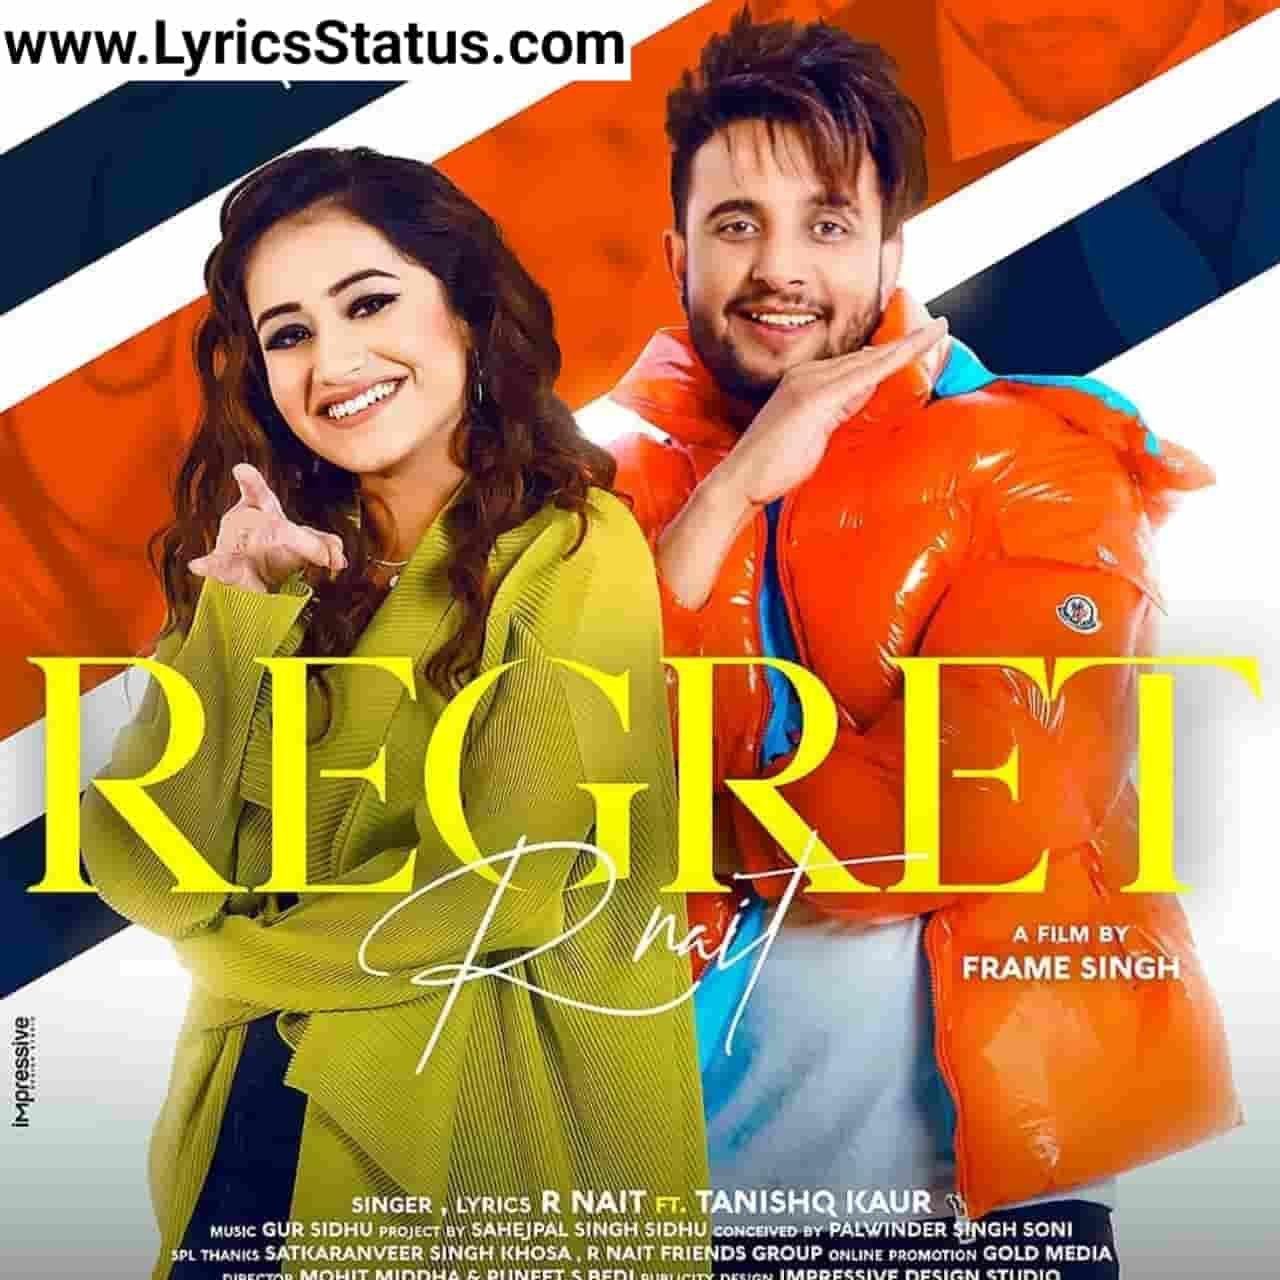 R Nait New Song Regret Tanishq Kaur Lyrics Status Download Yaar lakdi da mele chon khareed de si Ford Ni tu cell 'an wala lendi si jahaaj goriye.